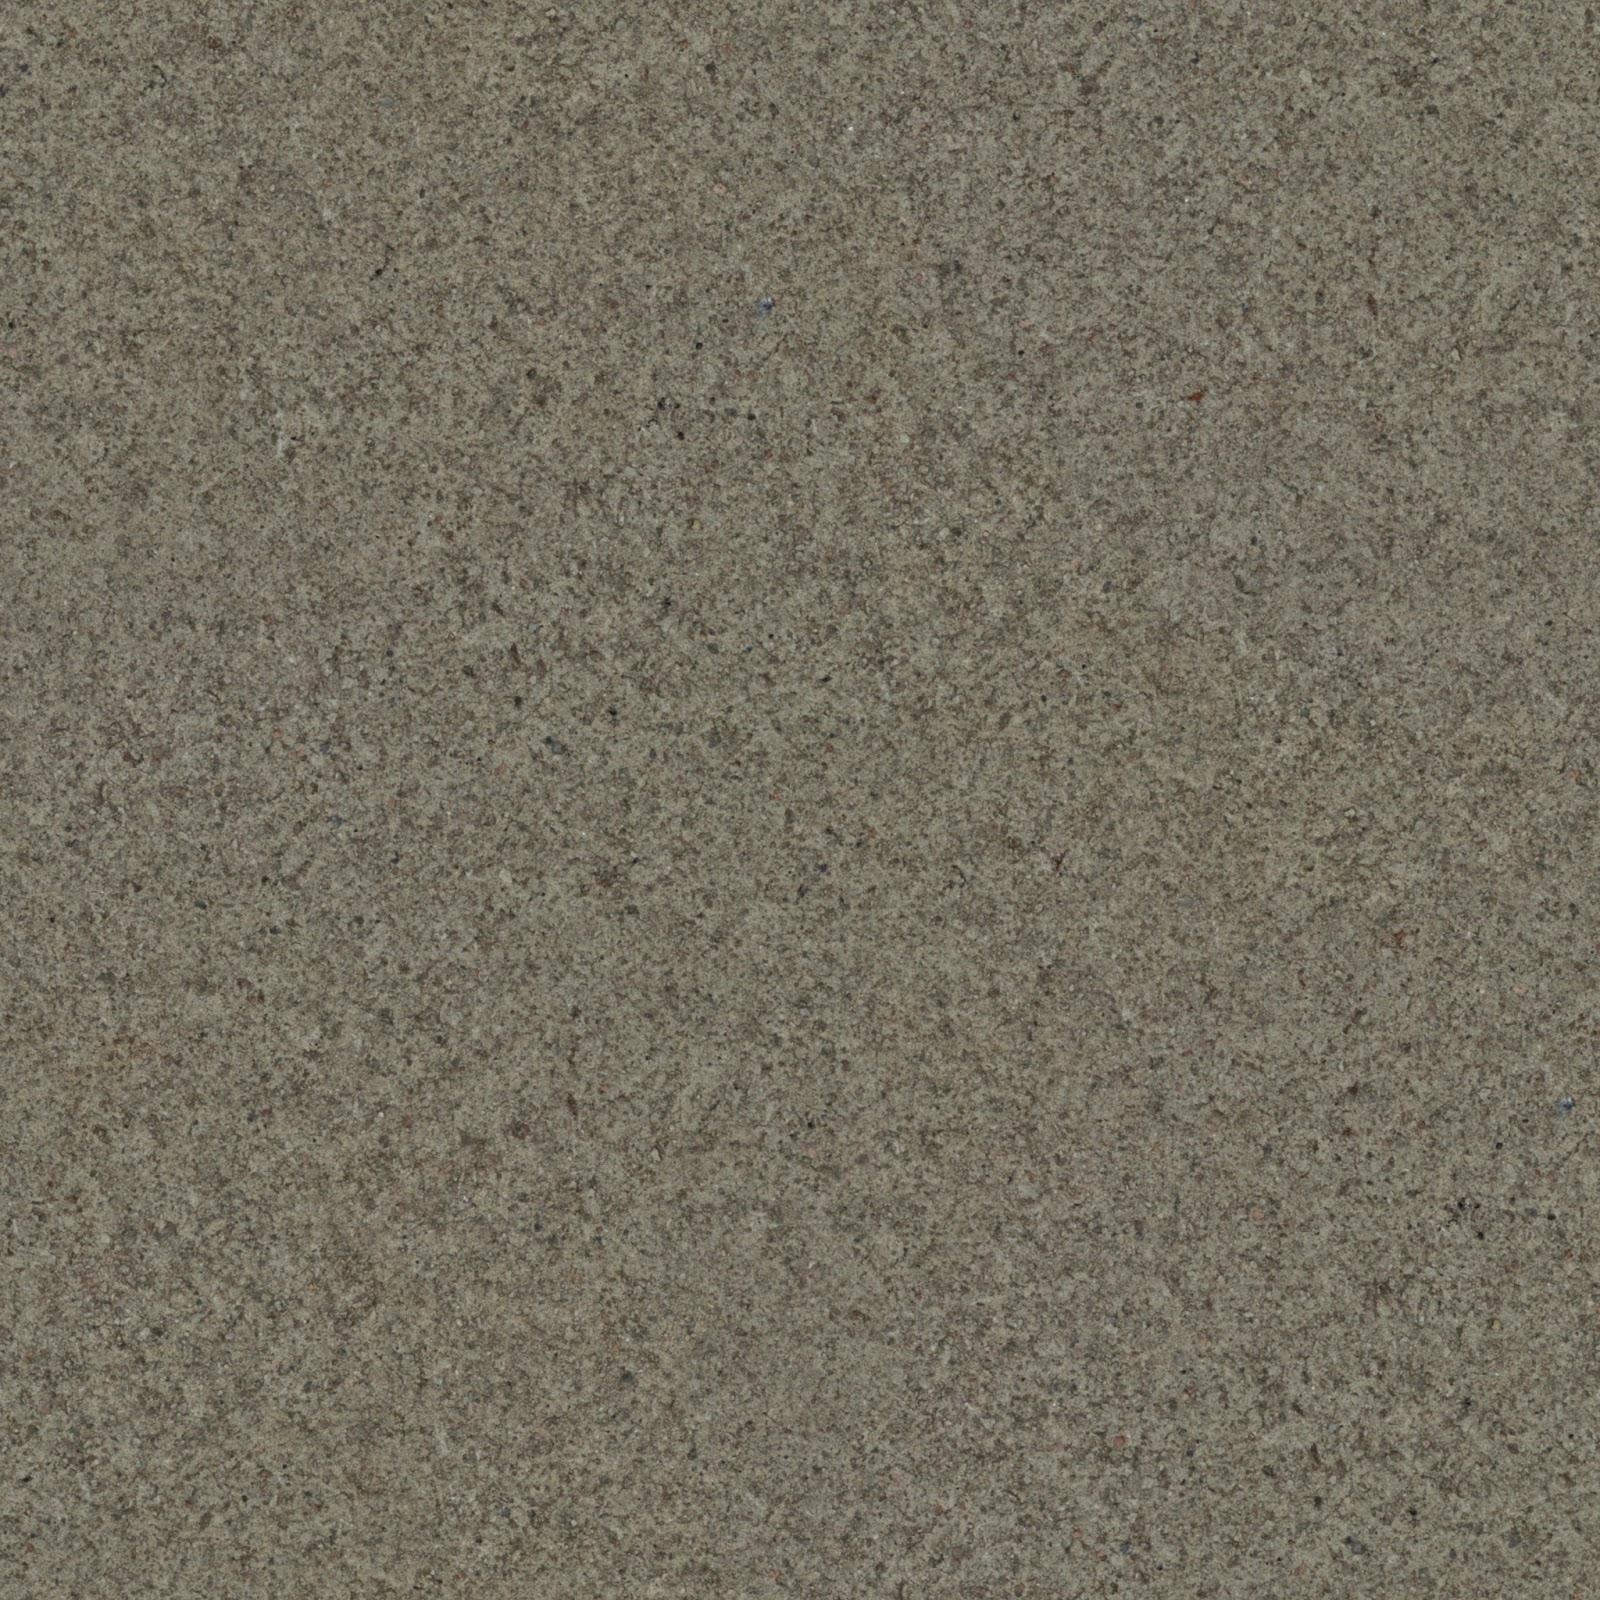 Concrete panel feb_2015_2 seamless texture 2048x2048